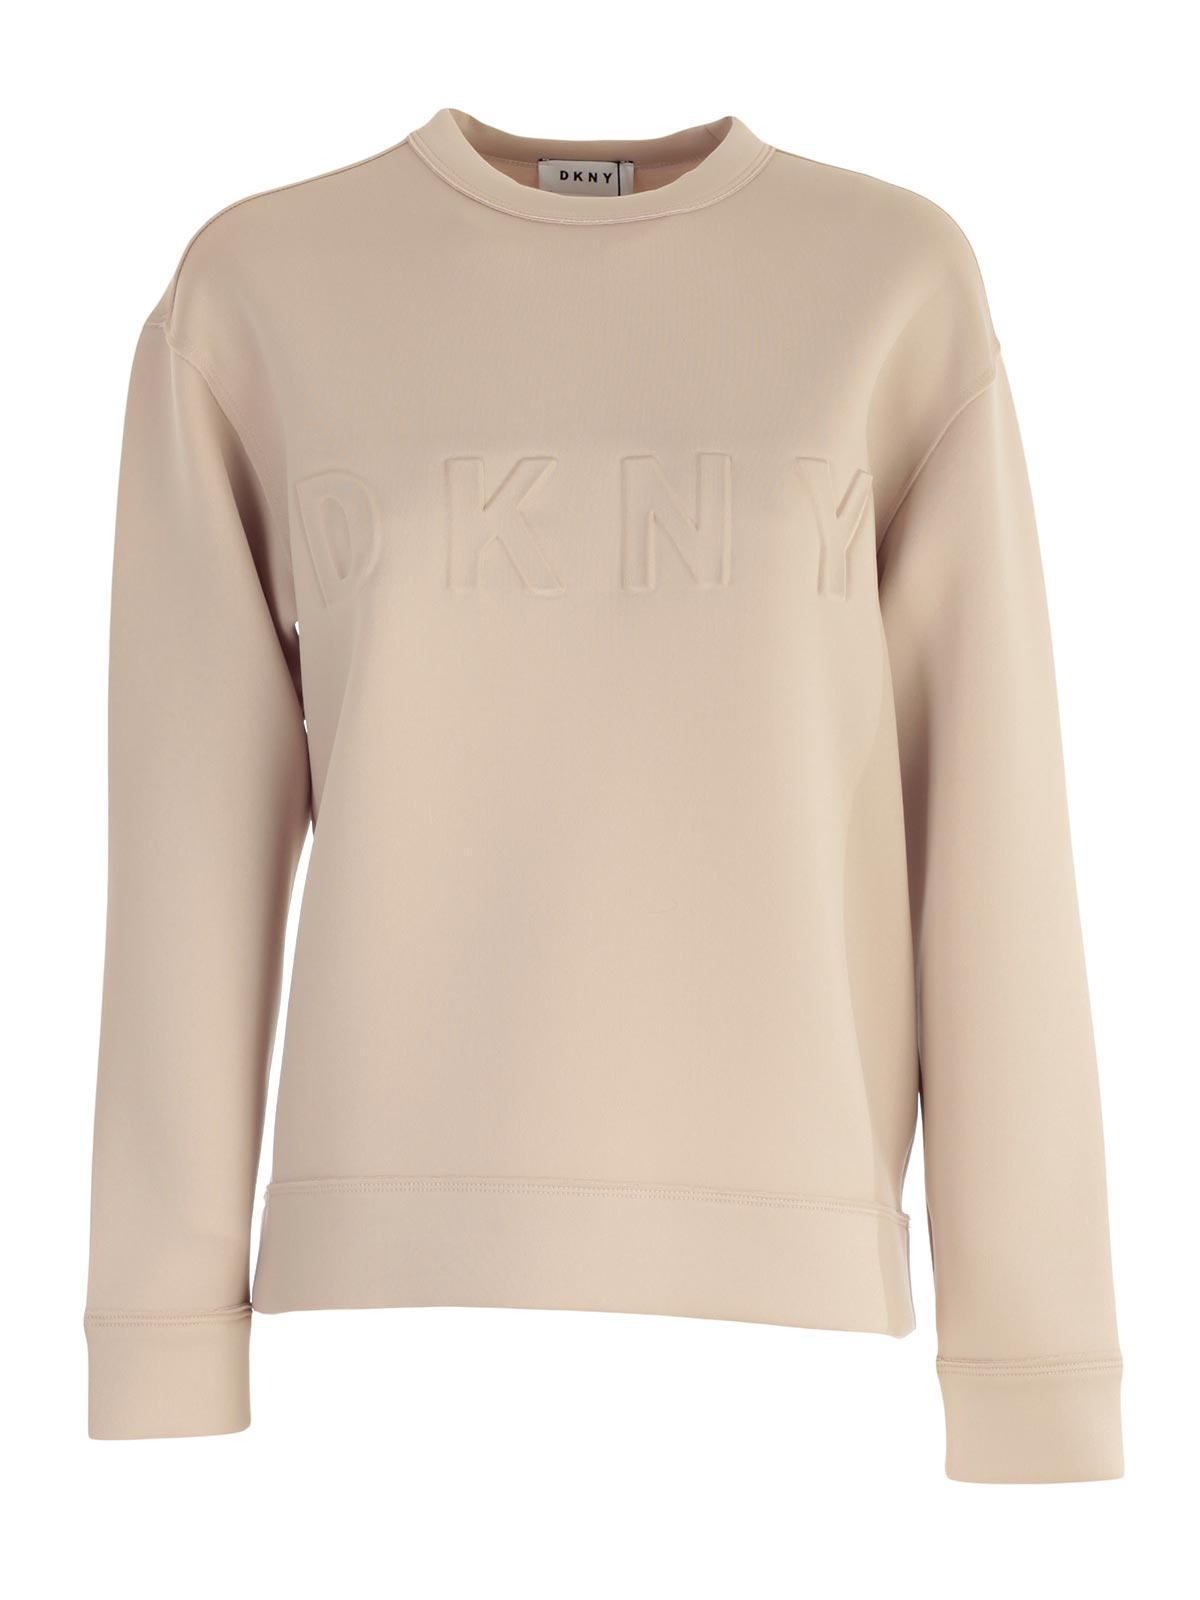 Picture of DKNY SweatShirt